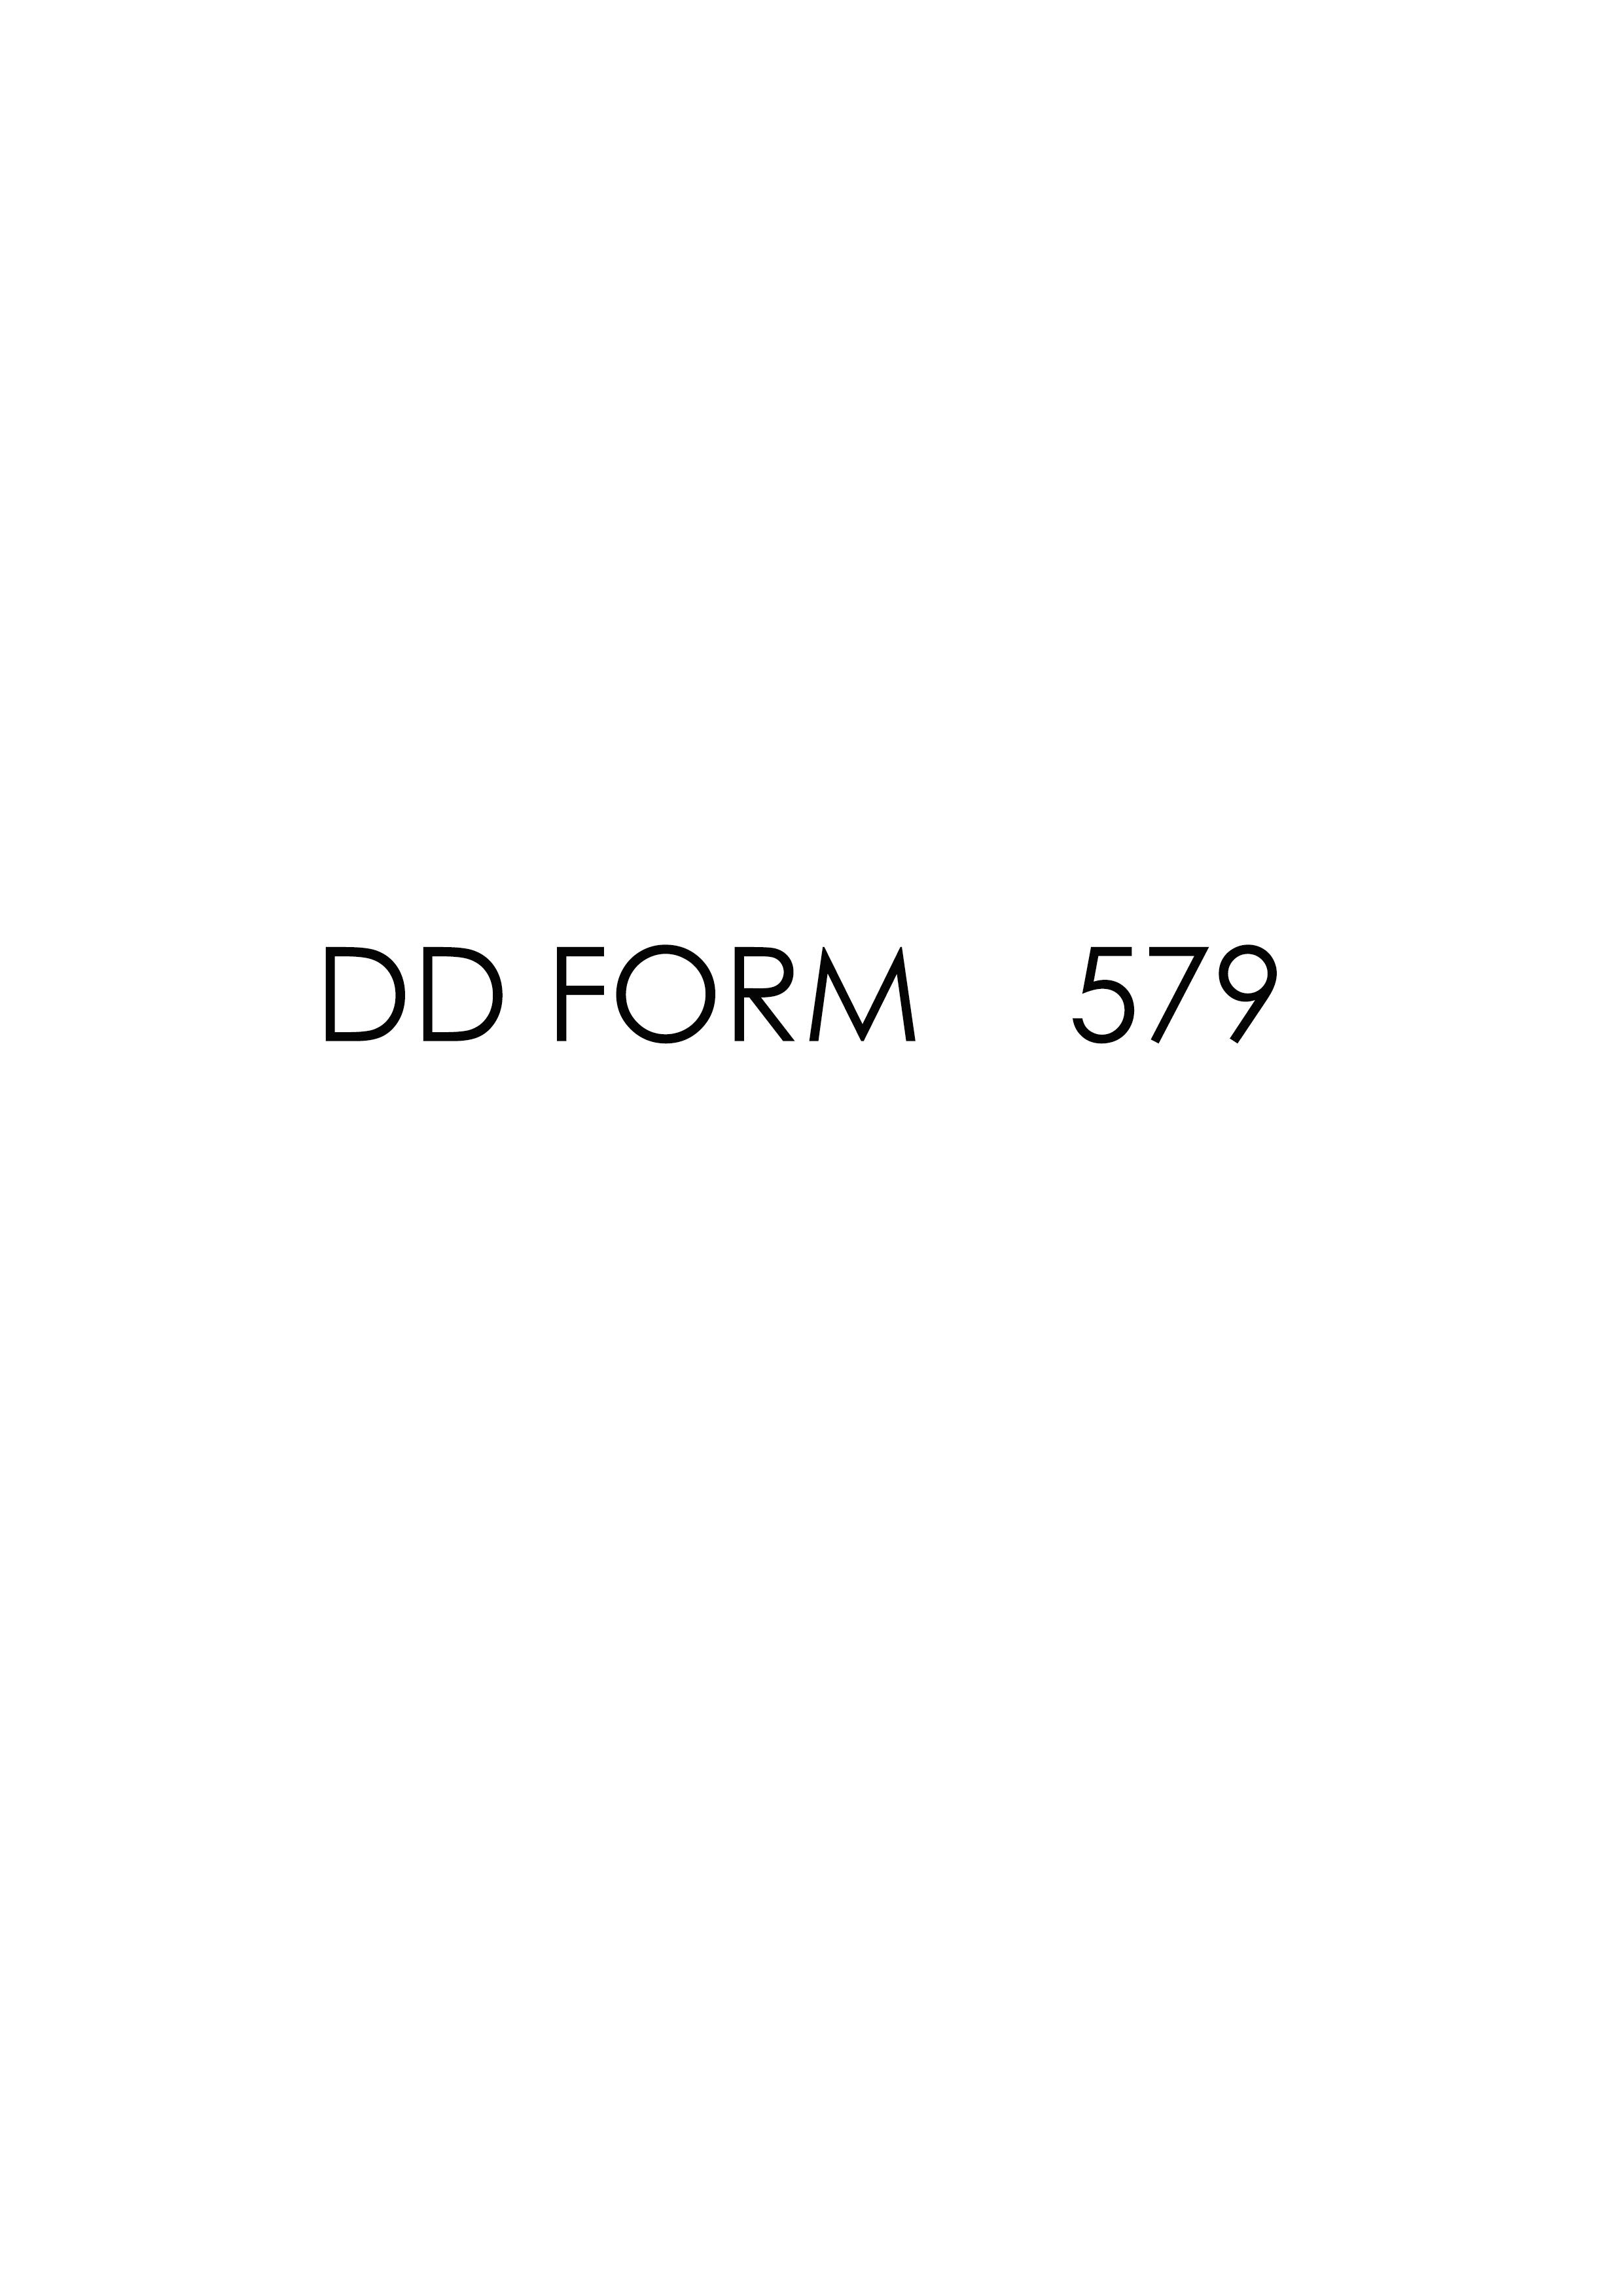 Download dd Form 579 Free